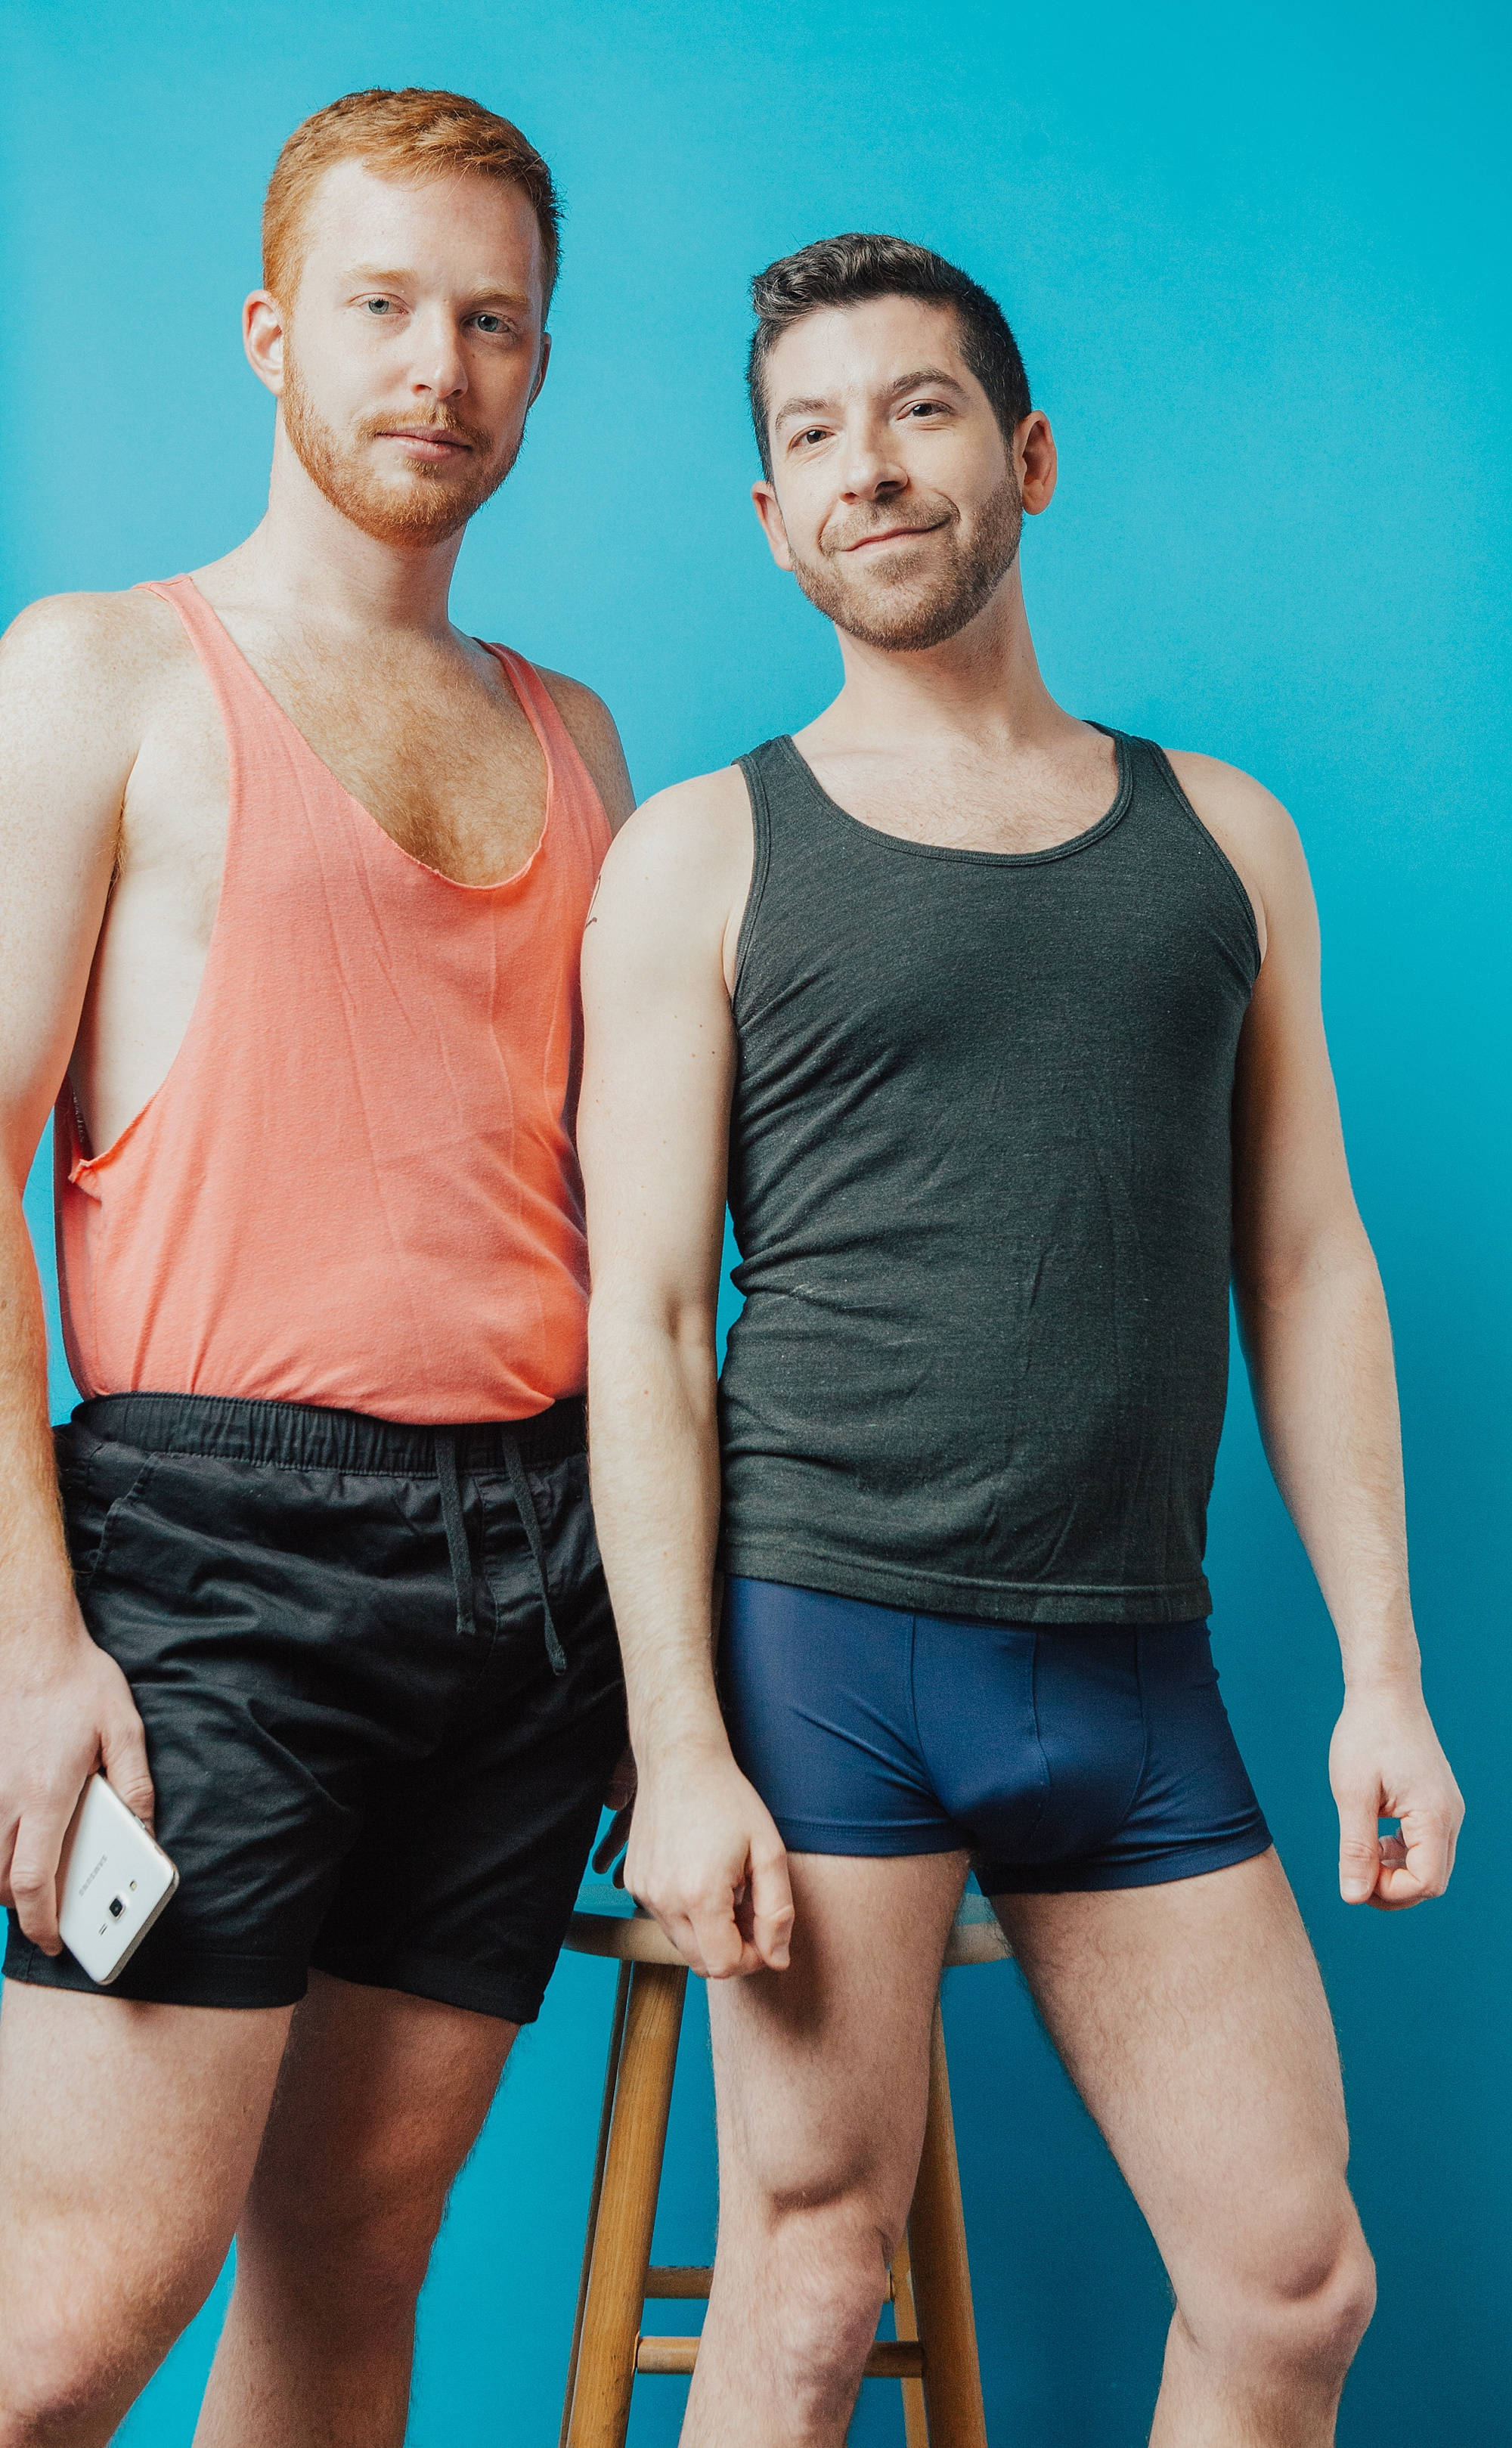 Joe_Mac_Creative_LGBT_Photographer_Philadelphia_Gay_Business__0002.jpg